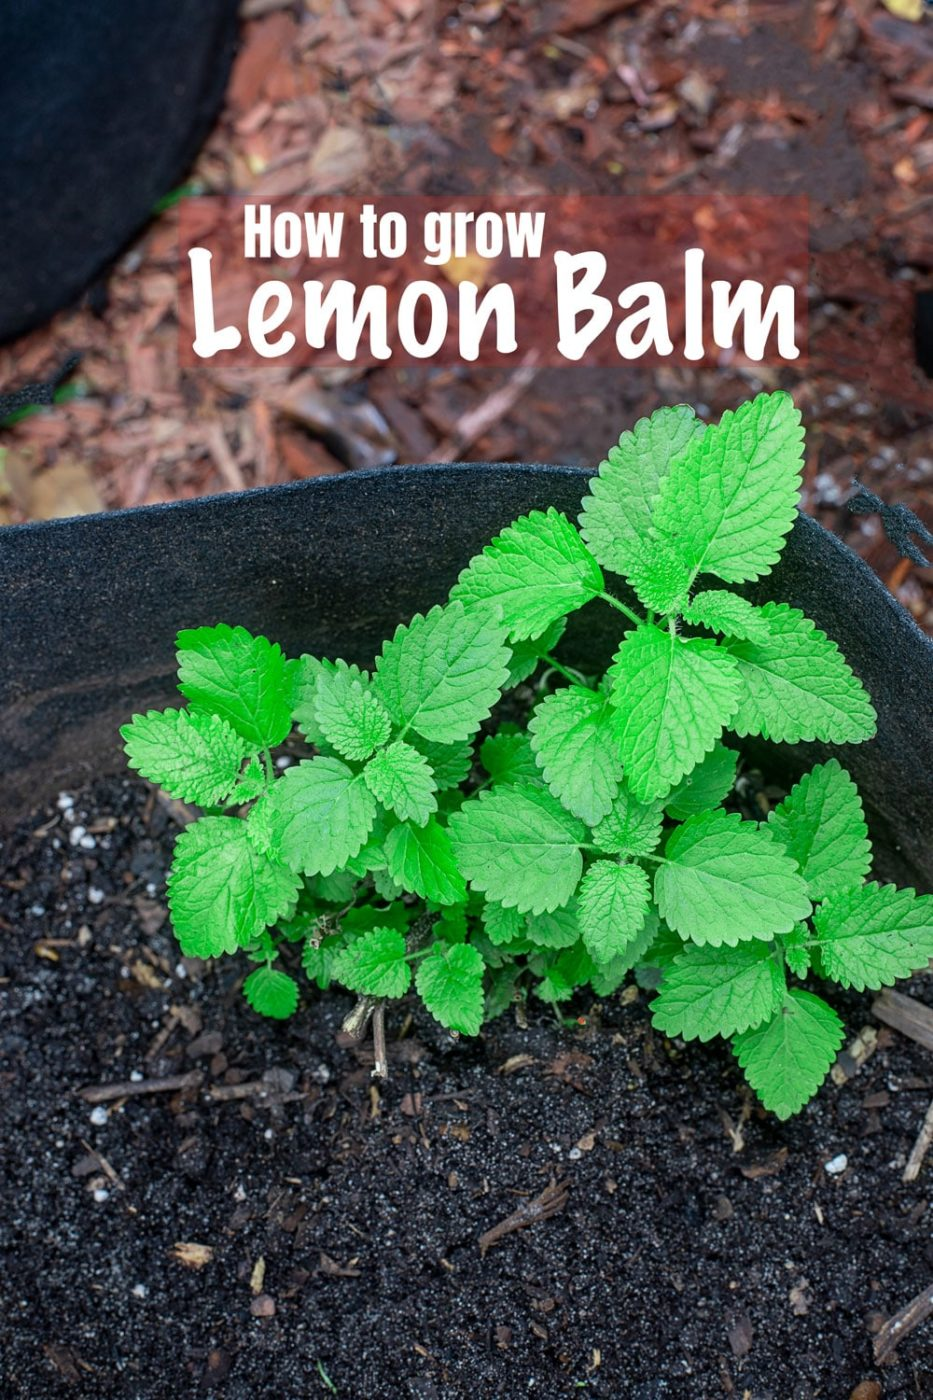 lemon balm plant in growing in a grow bag